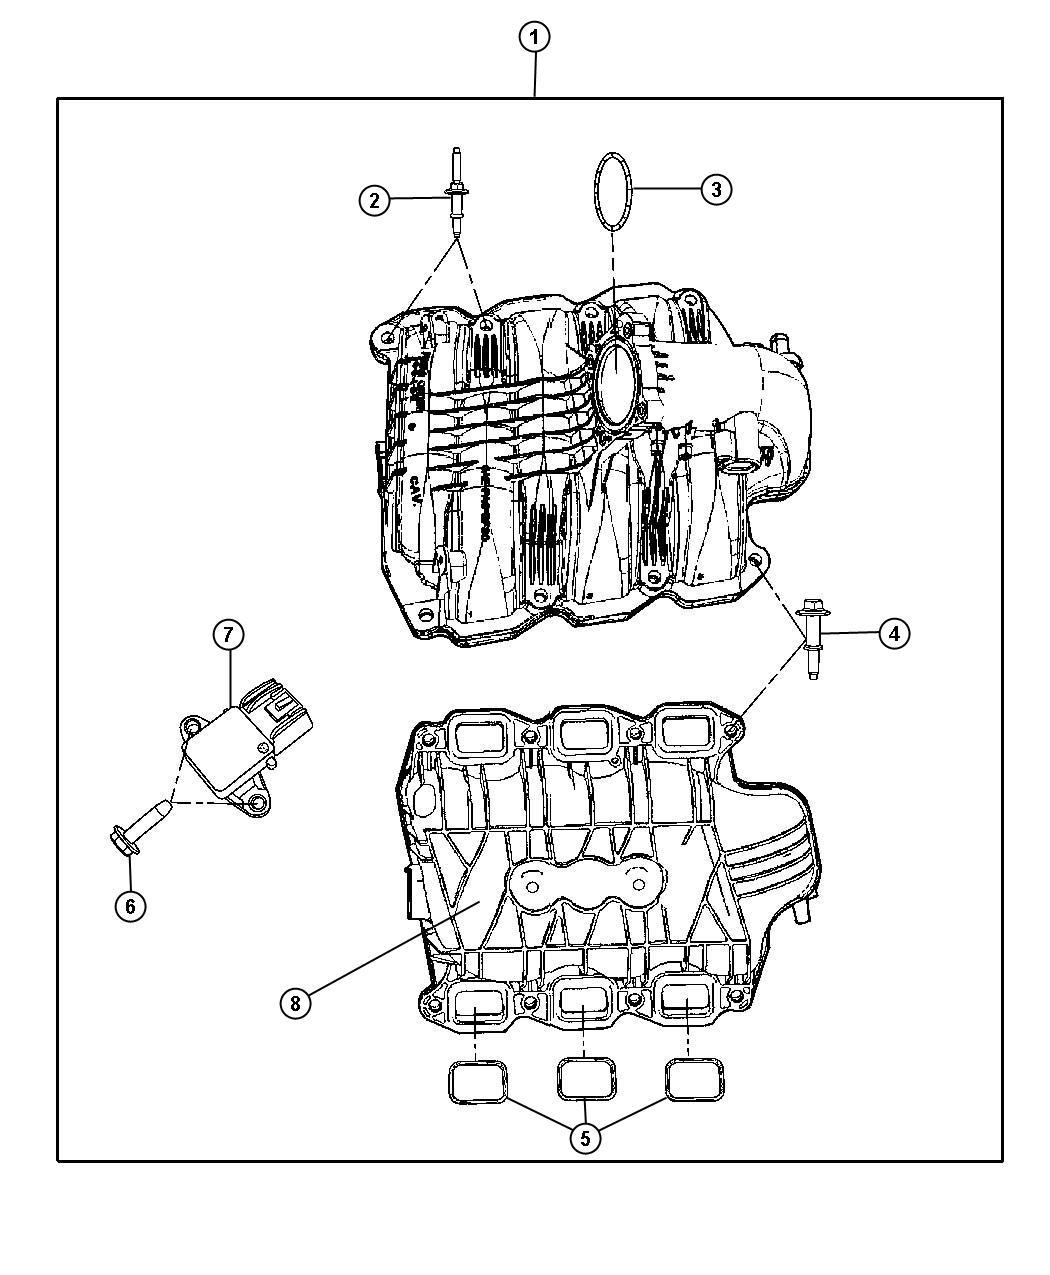 04666113AA     Chrysler    Gasket    Throttle       body        throttle       body